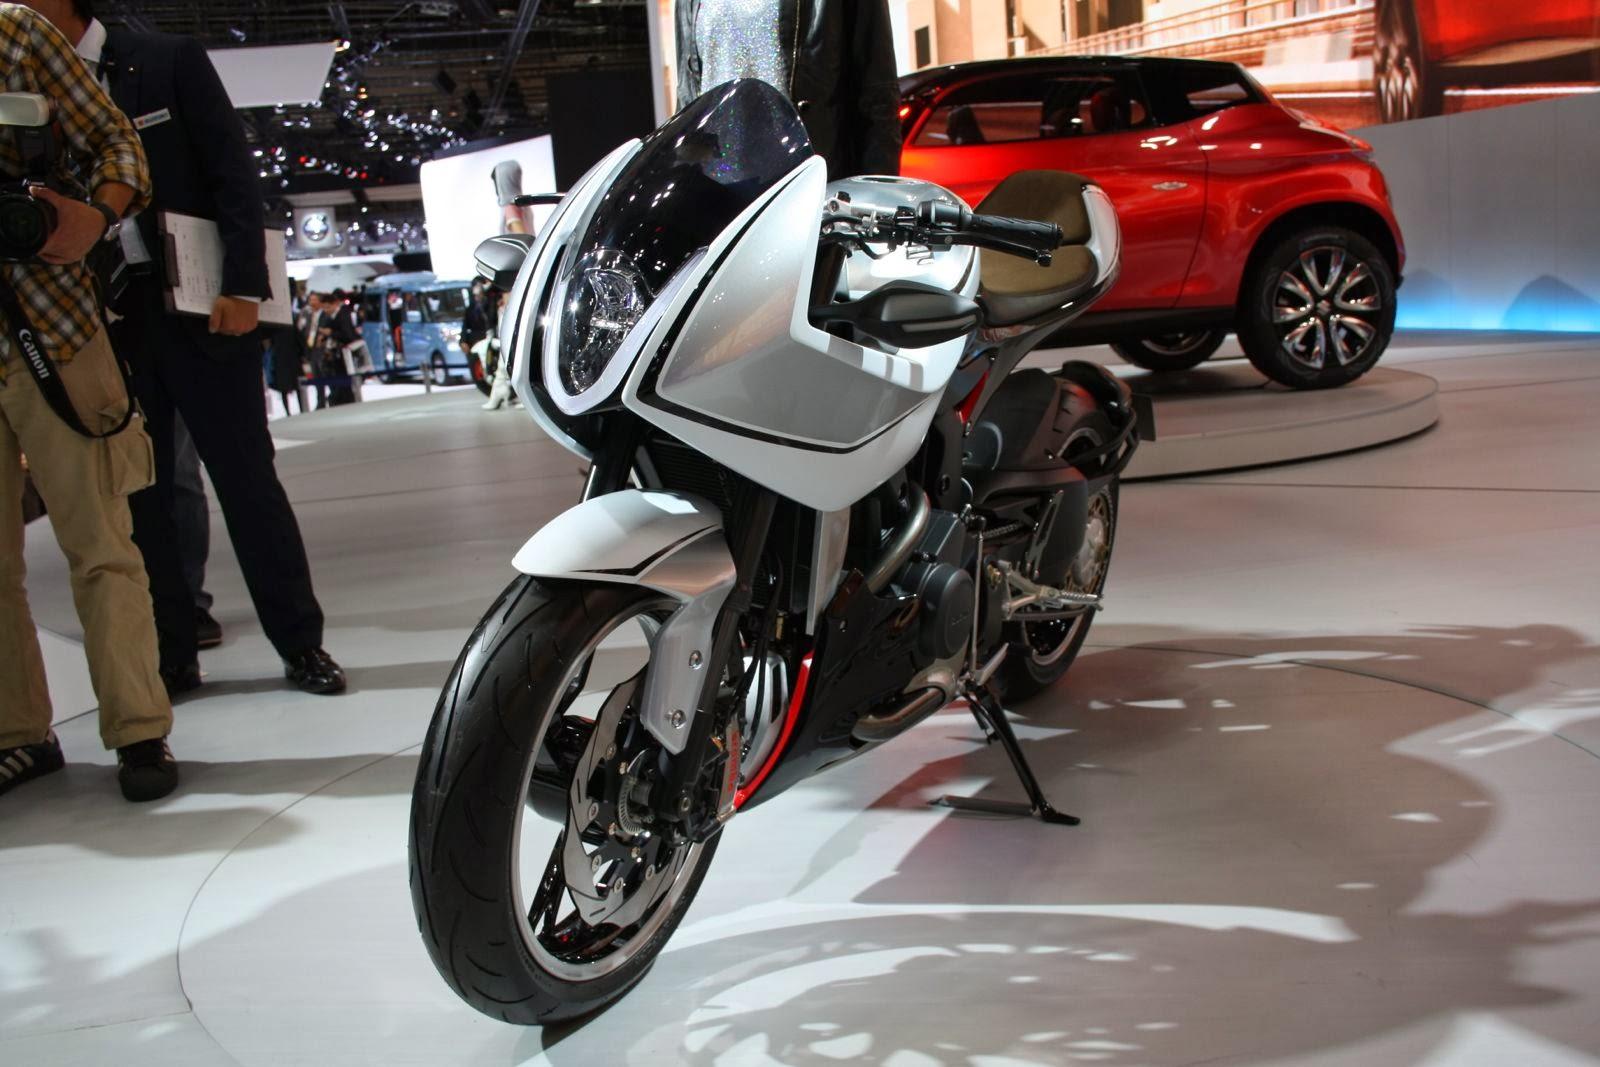 planet japan blog suzuki recursion tokyo motorcycle. Black Bedroom Furniture Sets. Home Design Ideas